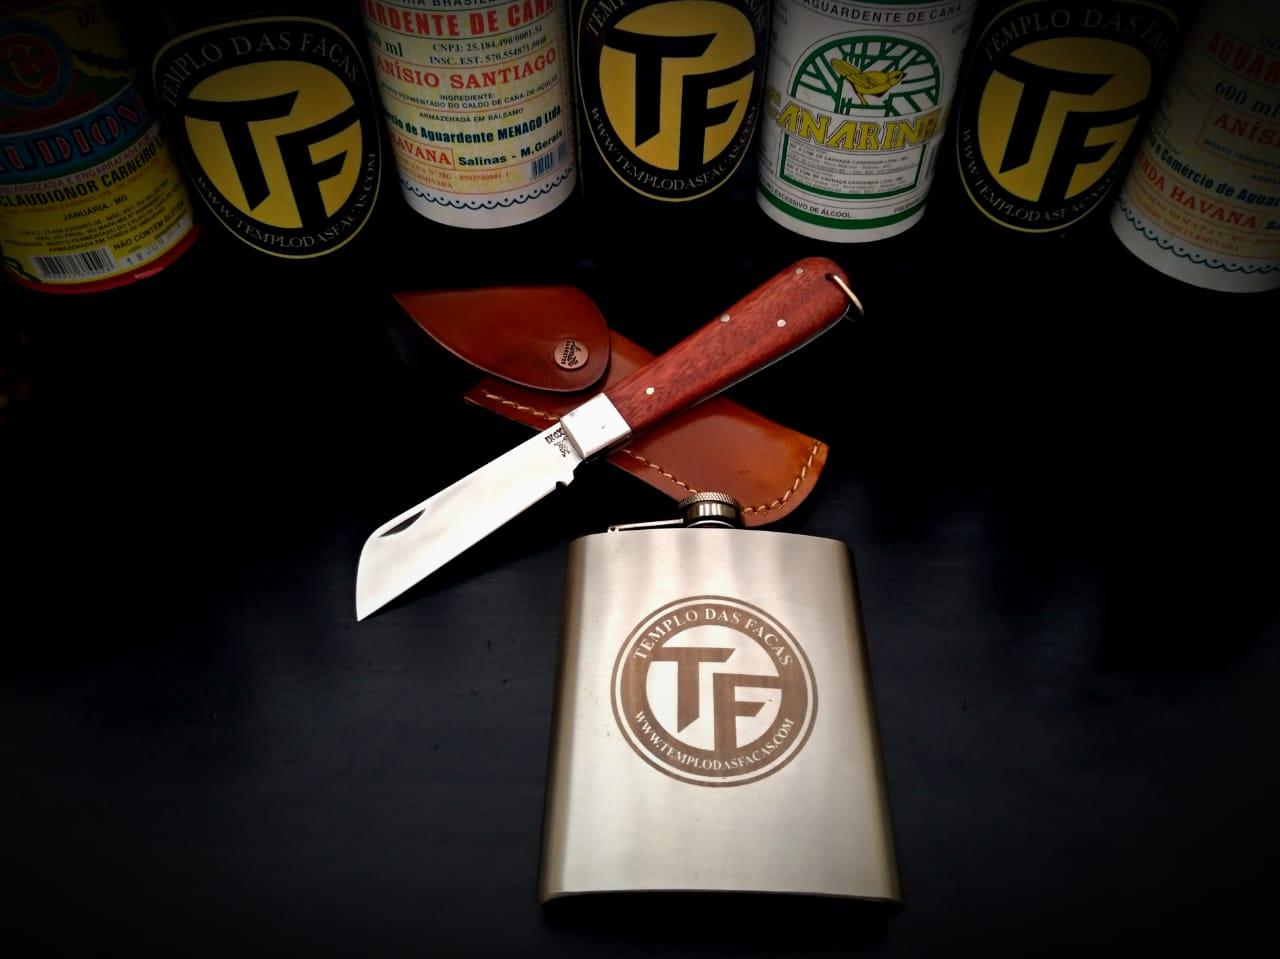 Canivete artesanal em aço inox cabo cabreúva